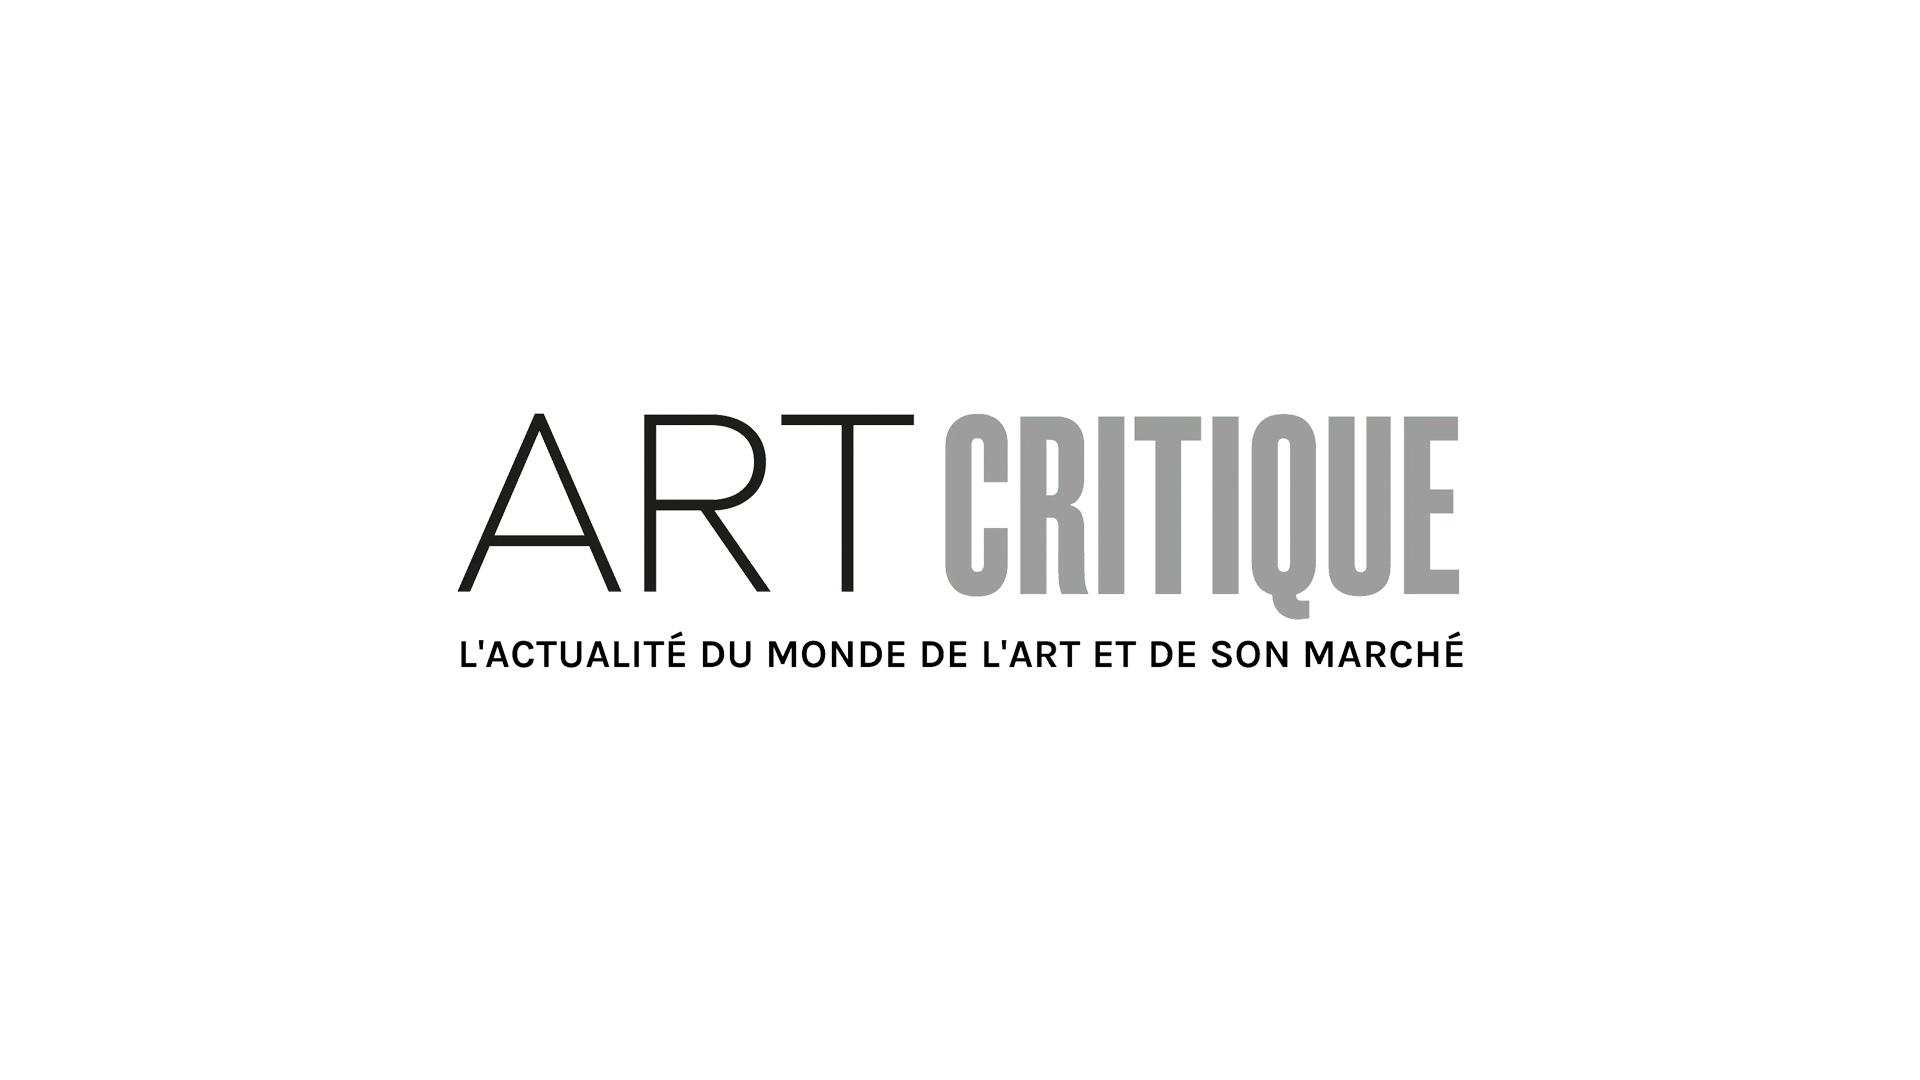 Highly Anticipated Salvator Mundi Display is Delayed Indefinitely